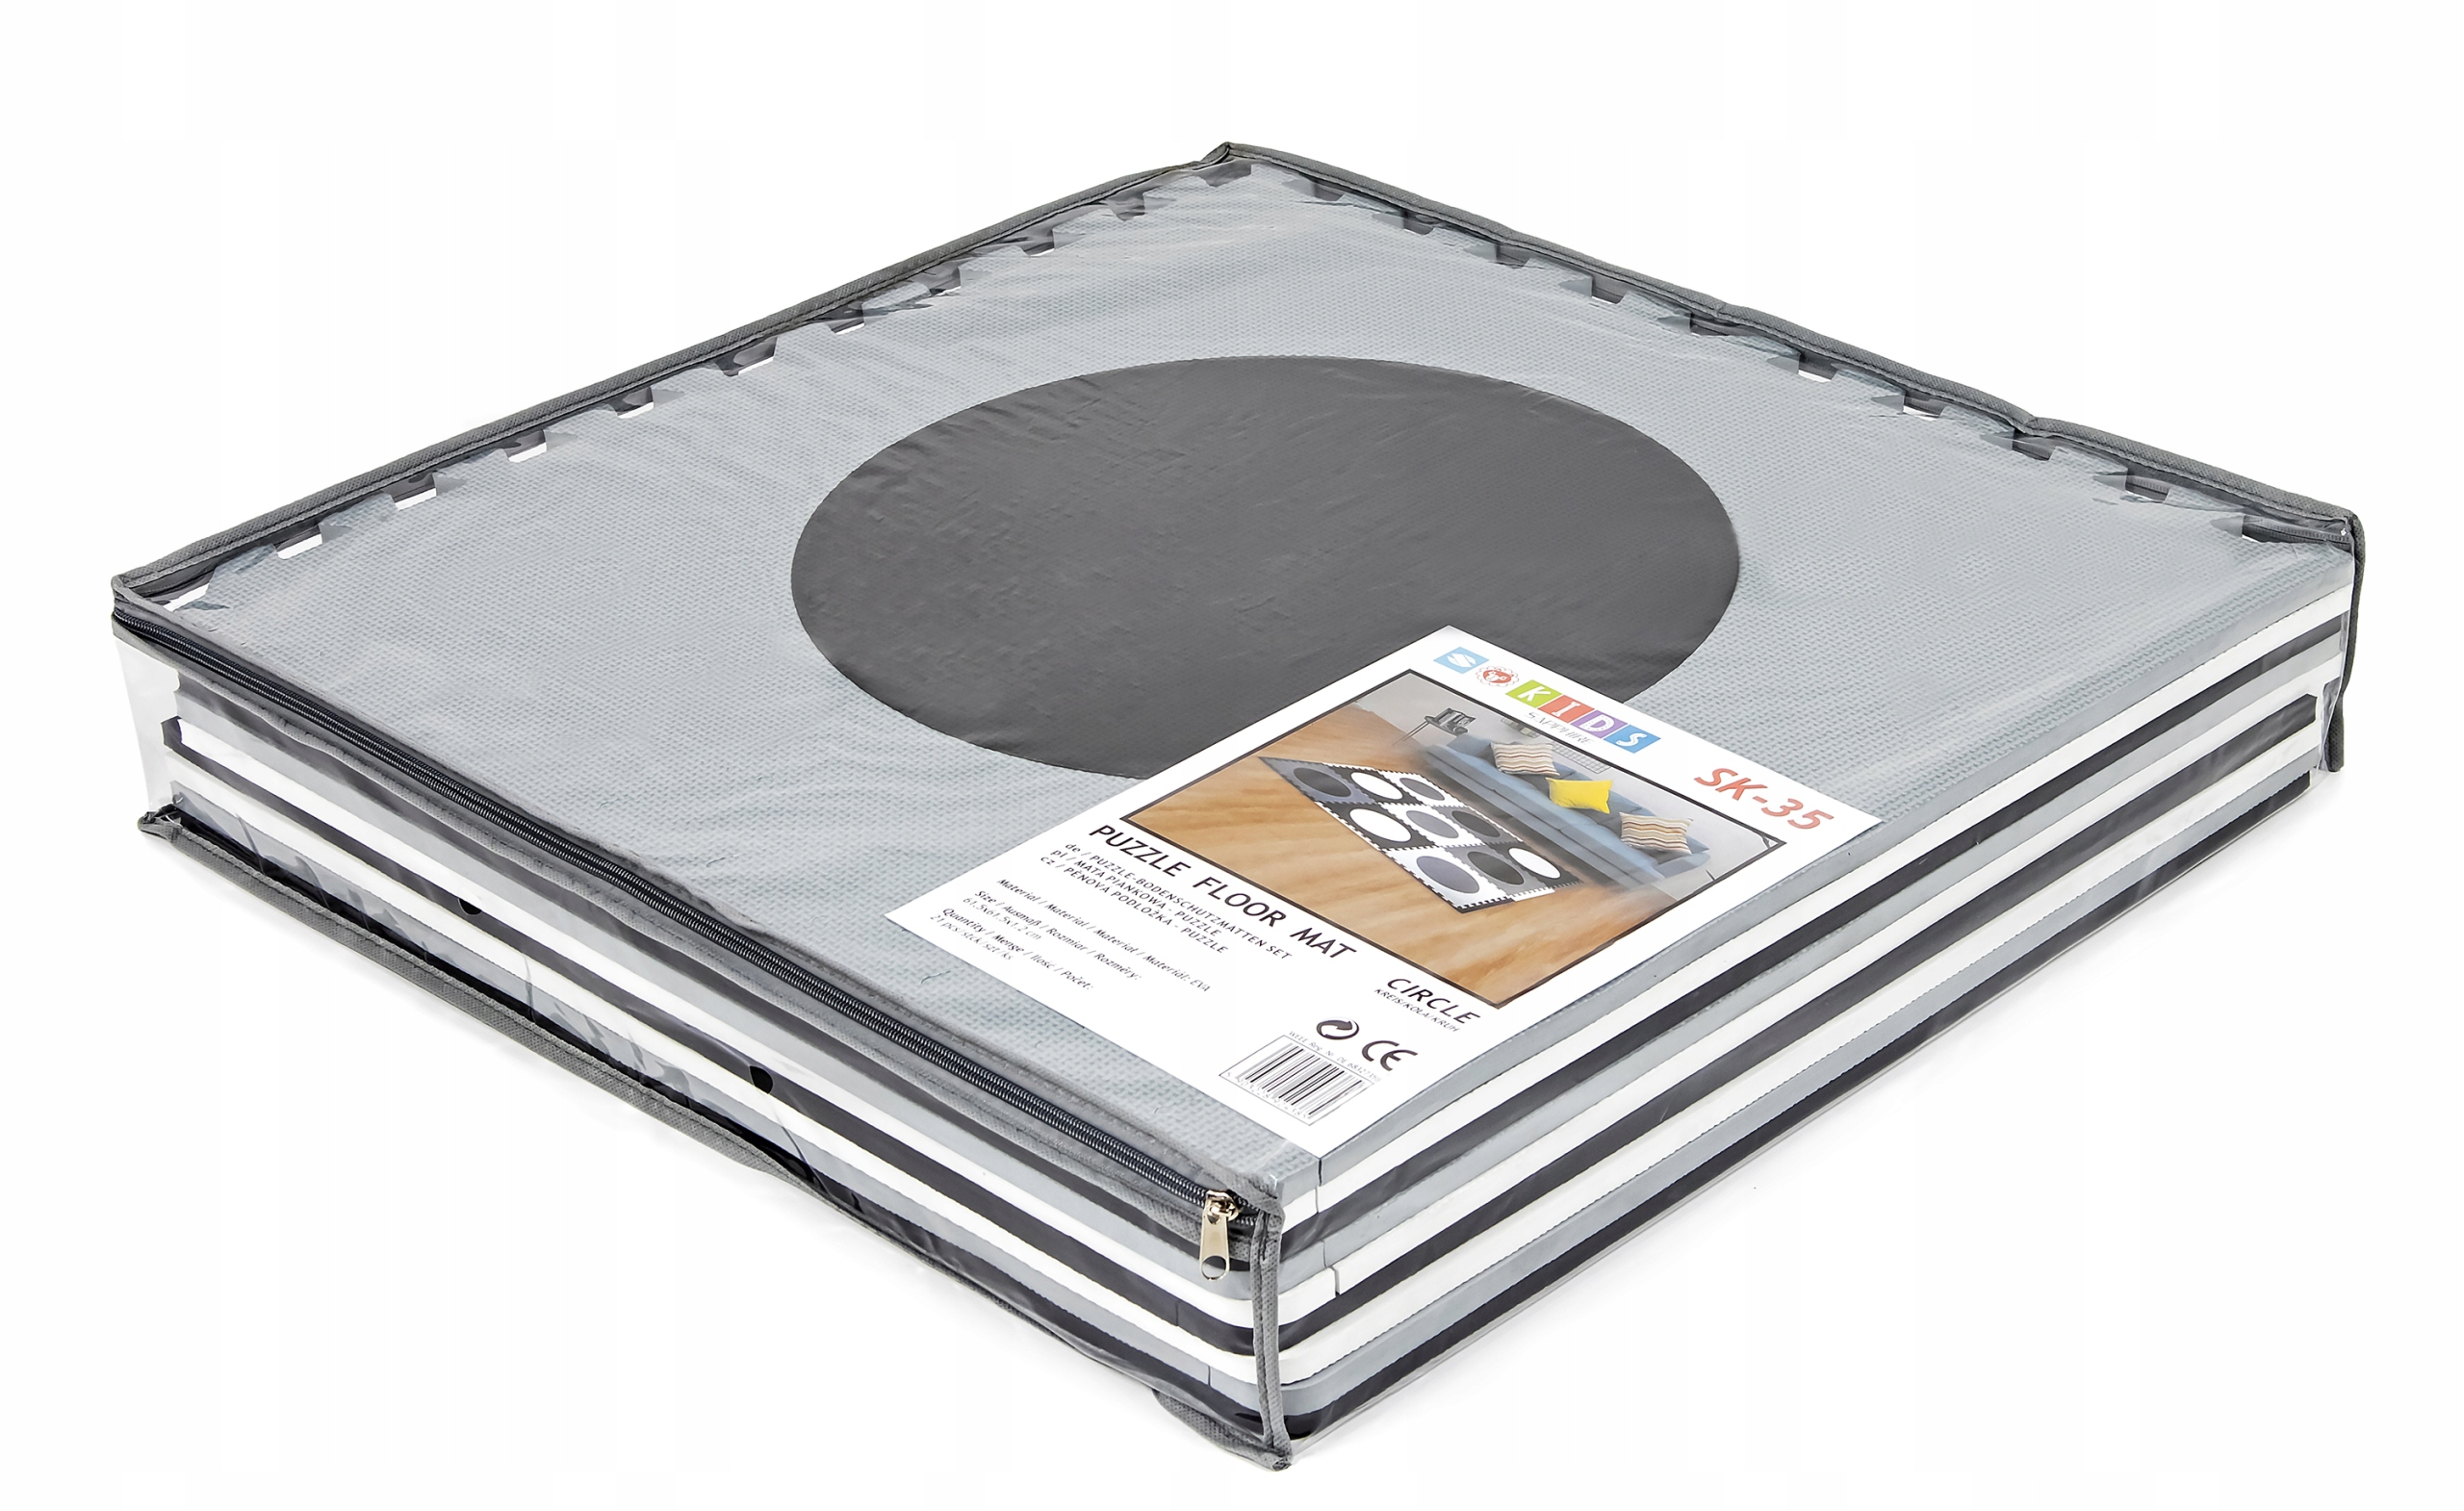 GRUBA MATA EDUKACYJNA puzzle PIANKOWE XXL 21szt Szerokość produktu 178 cm